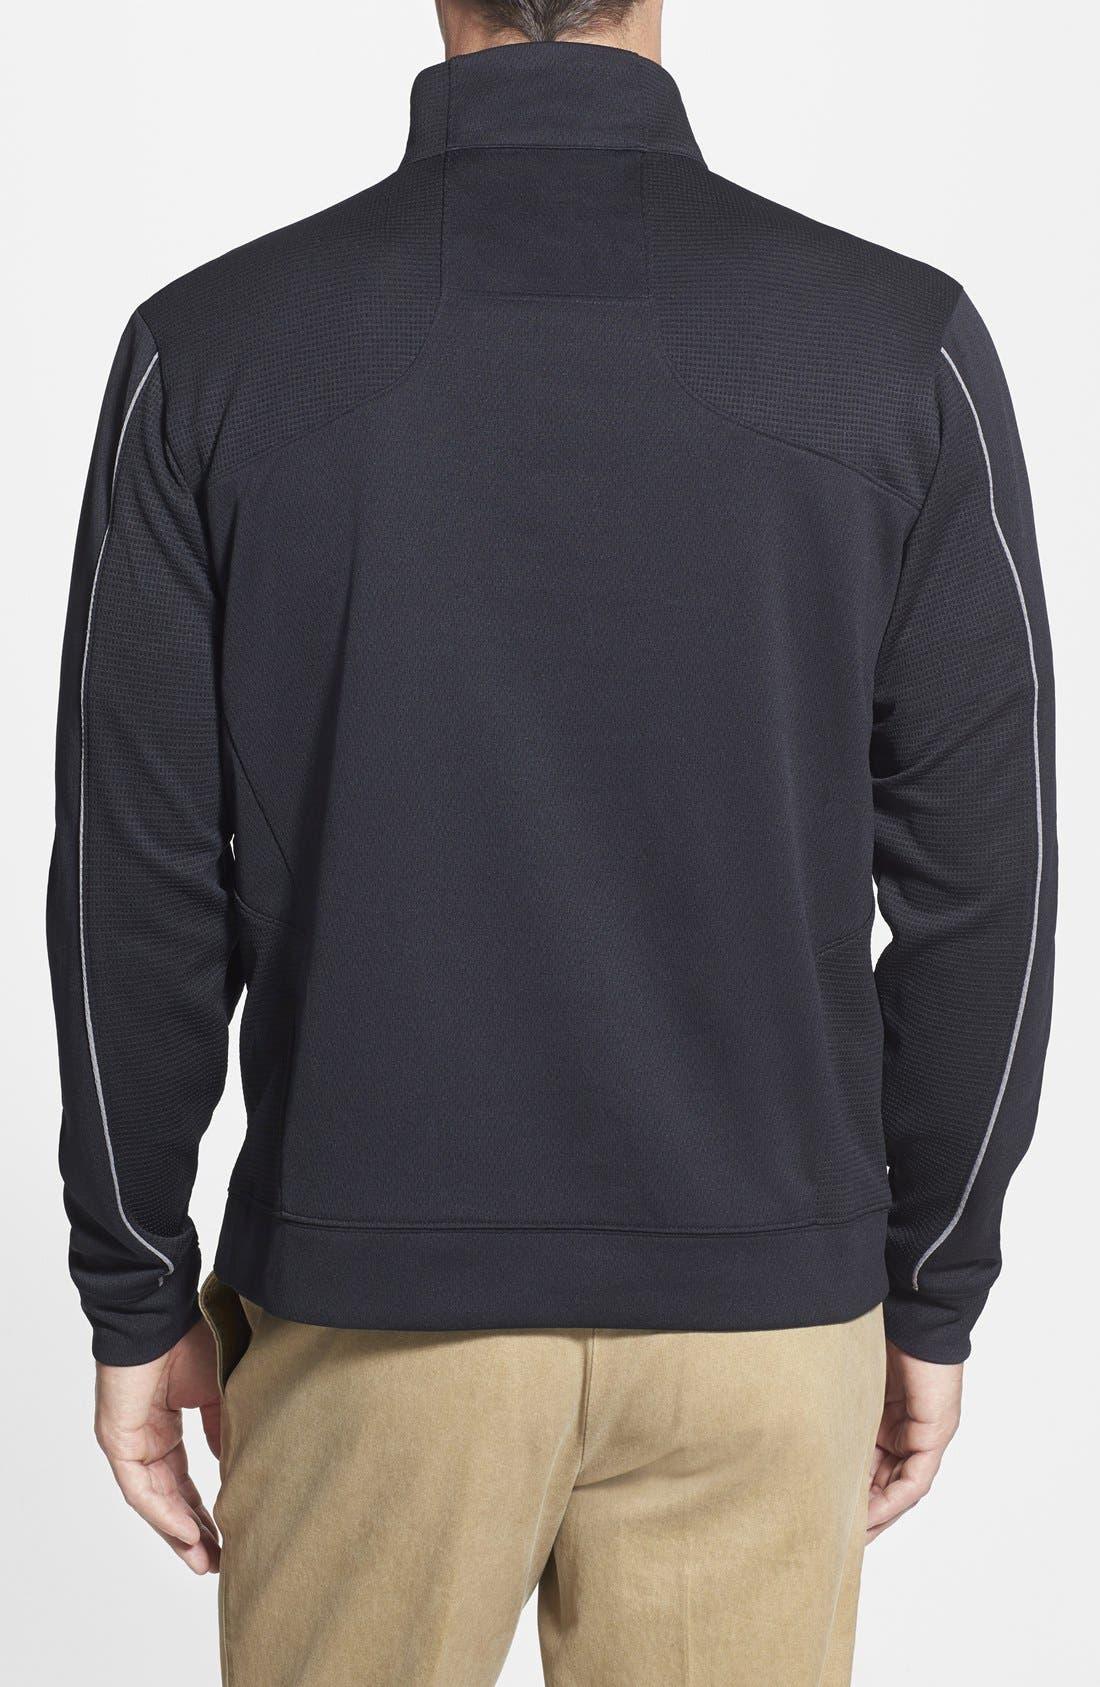 Pittsburgh Steelers - Edge DryTec Moisture Wicking Half Zip Pullover,                             Alternate thumbnail 2, color,                             001